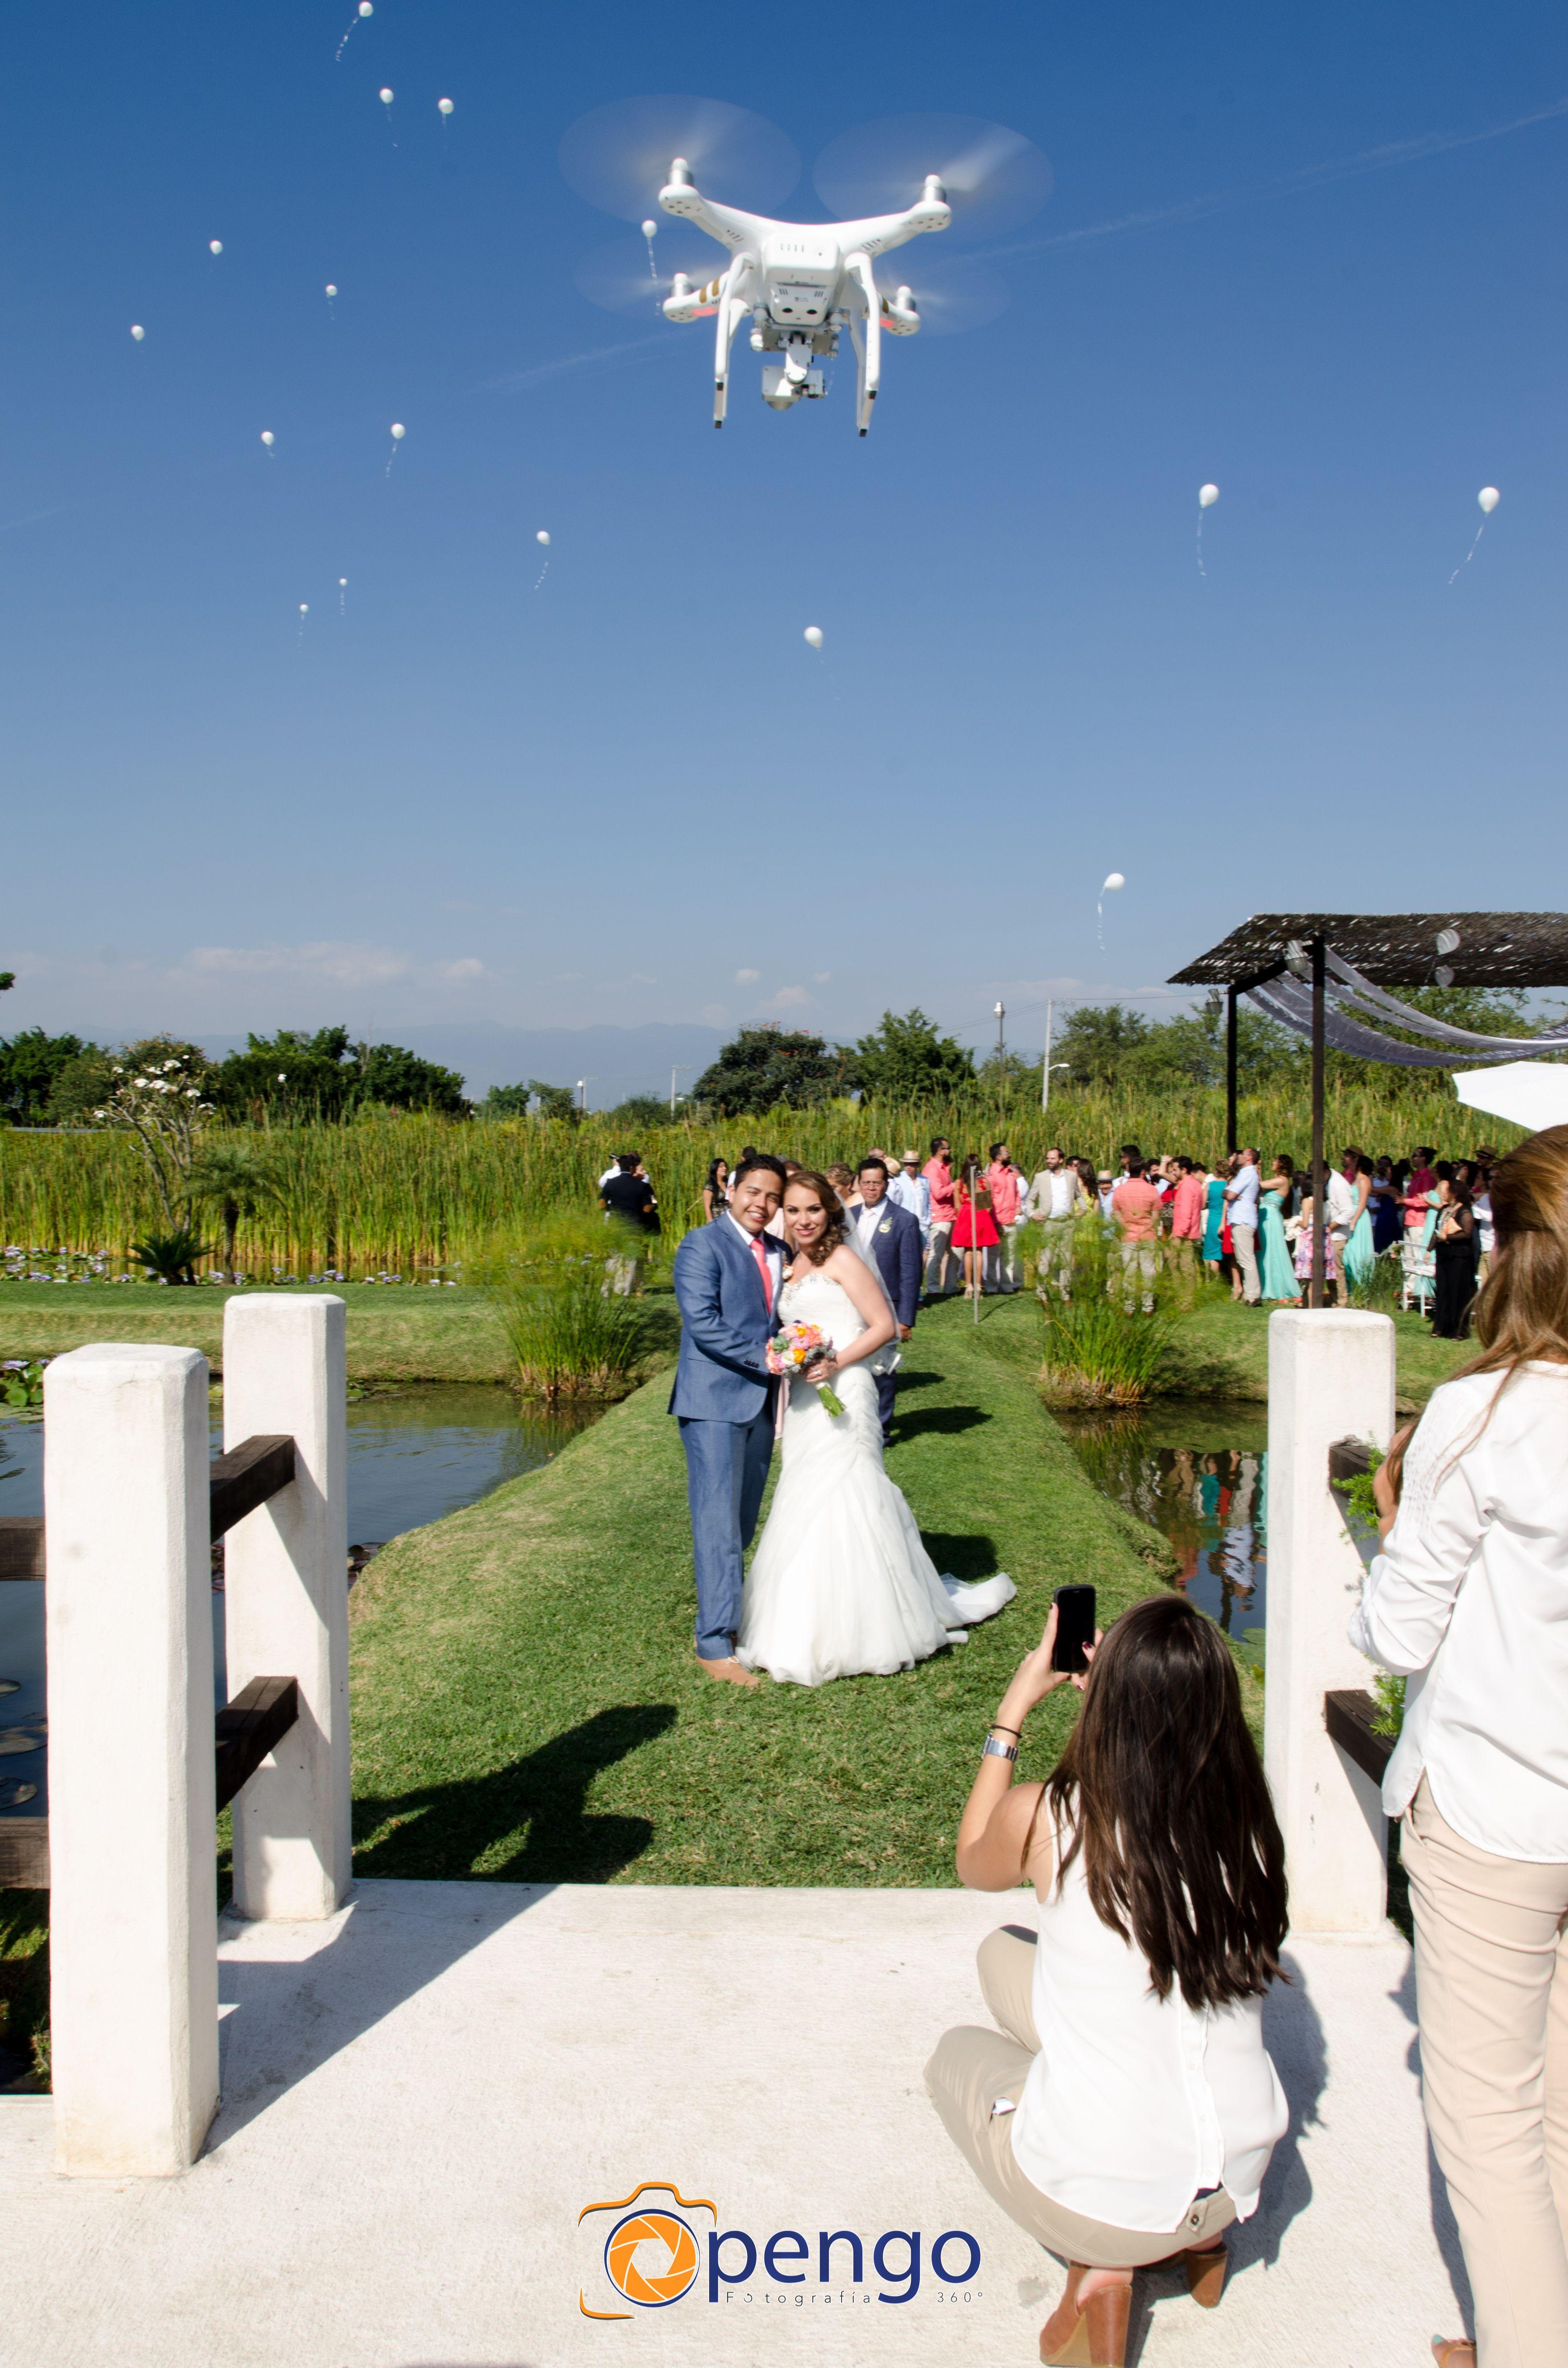 #Cuernavaca #Bodas #Boda #Morelos #Opengo #Wedding #Novios #WeddingPhotography #Photography #FotografodeBodas #FotografiadeBodas #WeddingMorelos #BodasCuernavaca #RamirezGastronomia #JardinSantaBarbara #JardinBrenna #JardinFincaLaConcordia